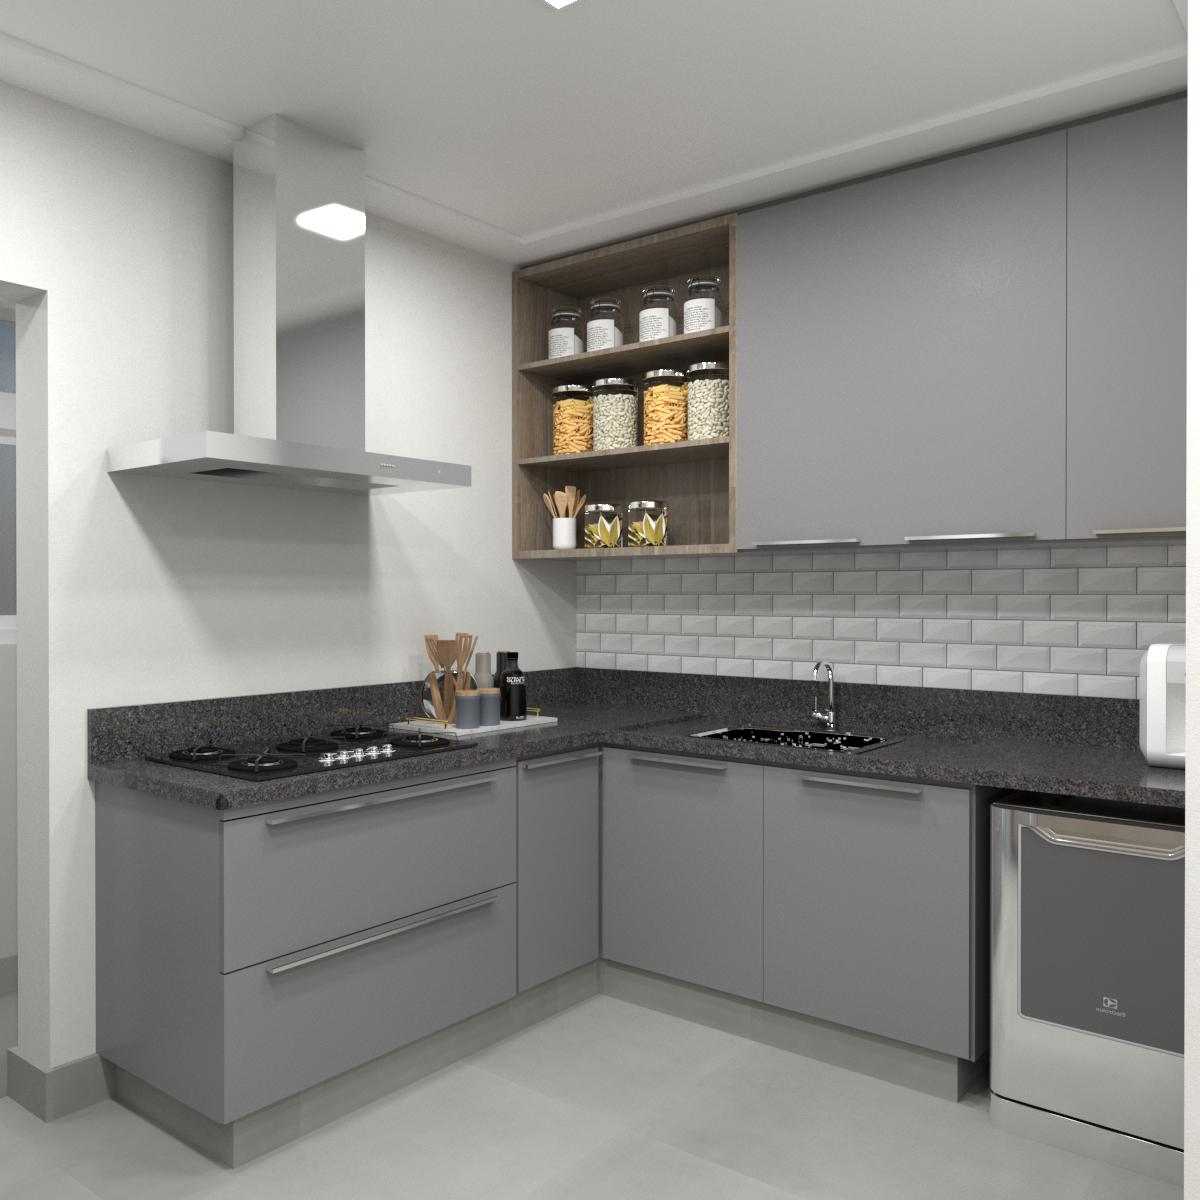 desktop_kitchen7.png